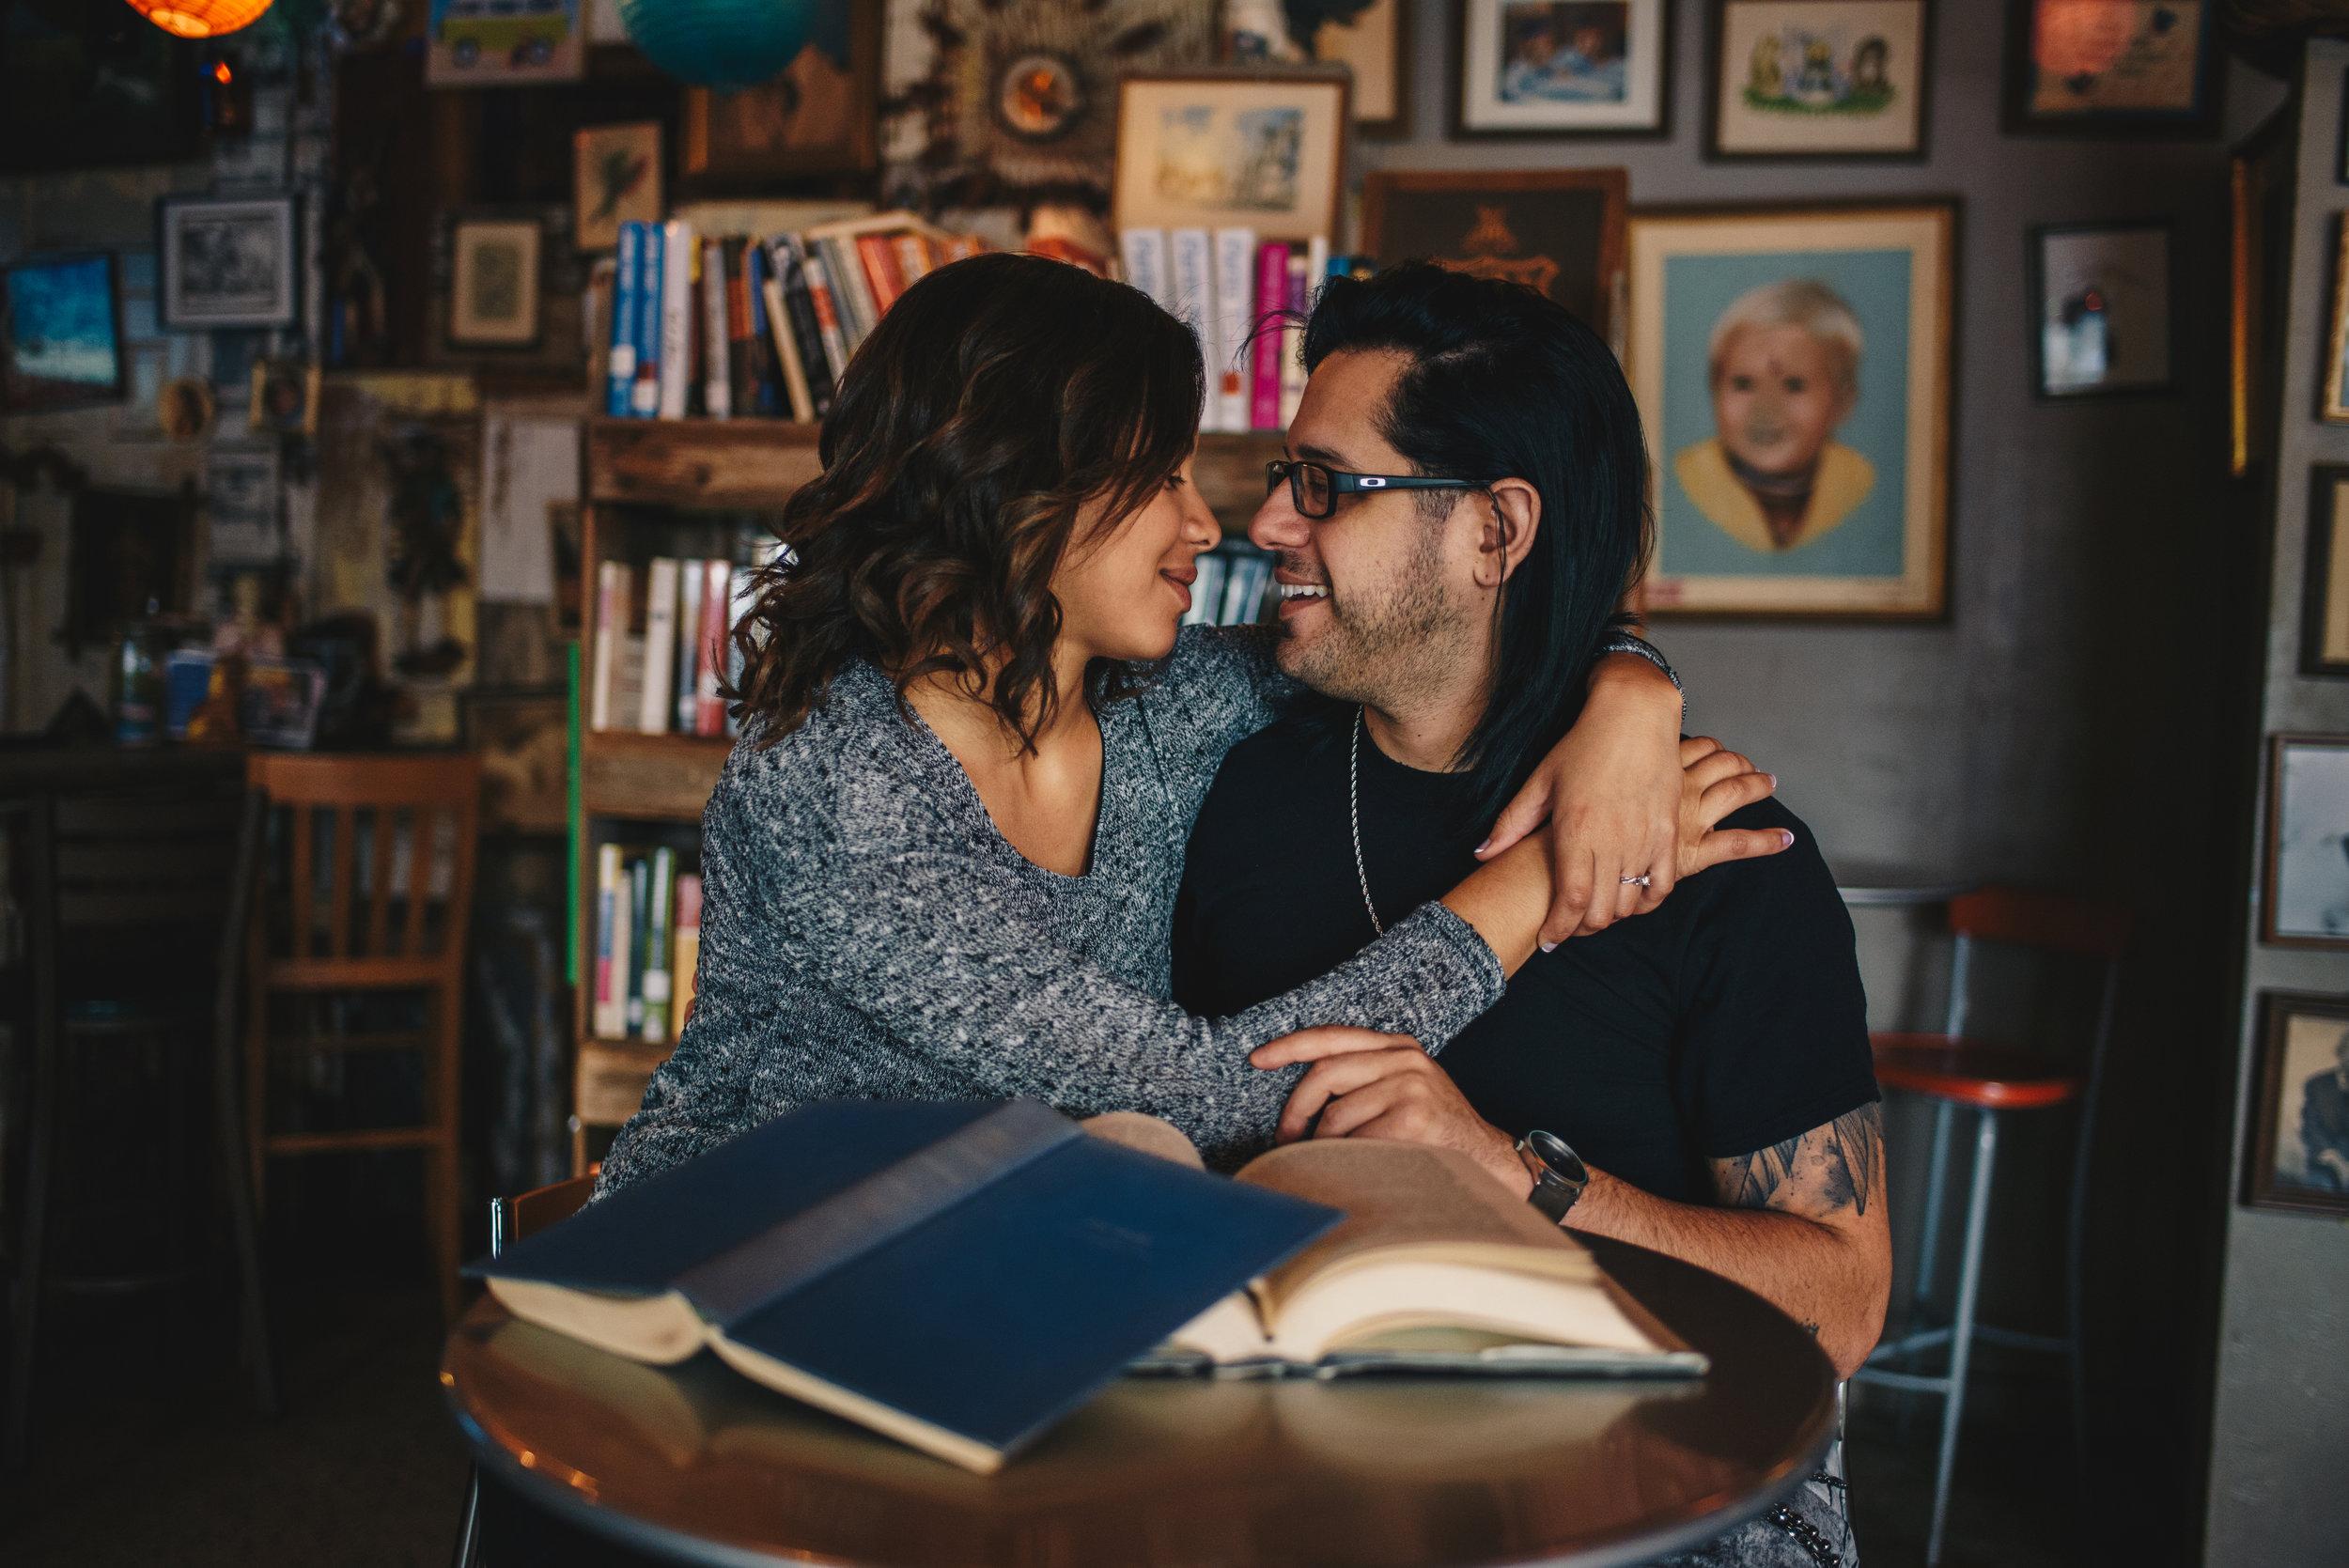 Los-Vargas-Photo-Central-Florida-Engagement-Coffee-Shop-Session-60.jpg